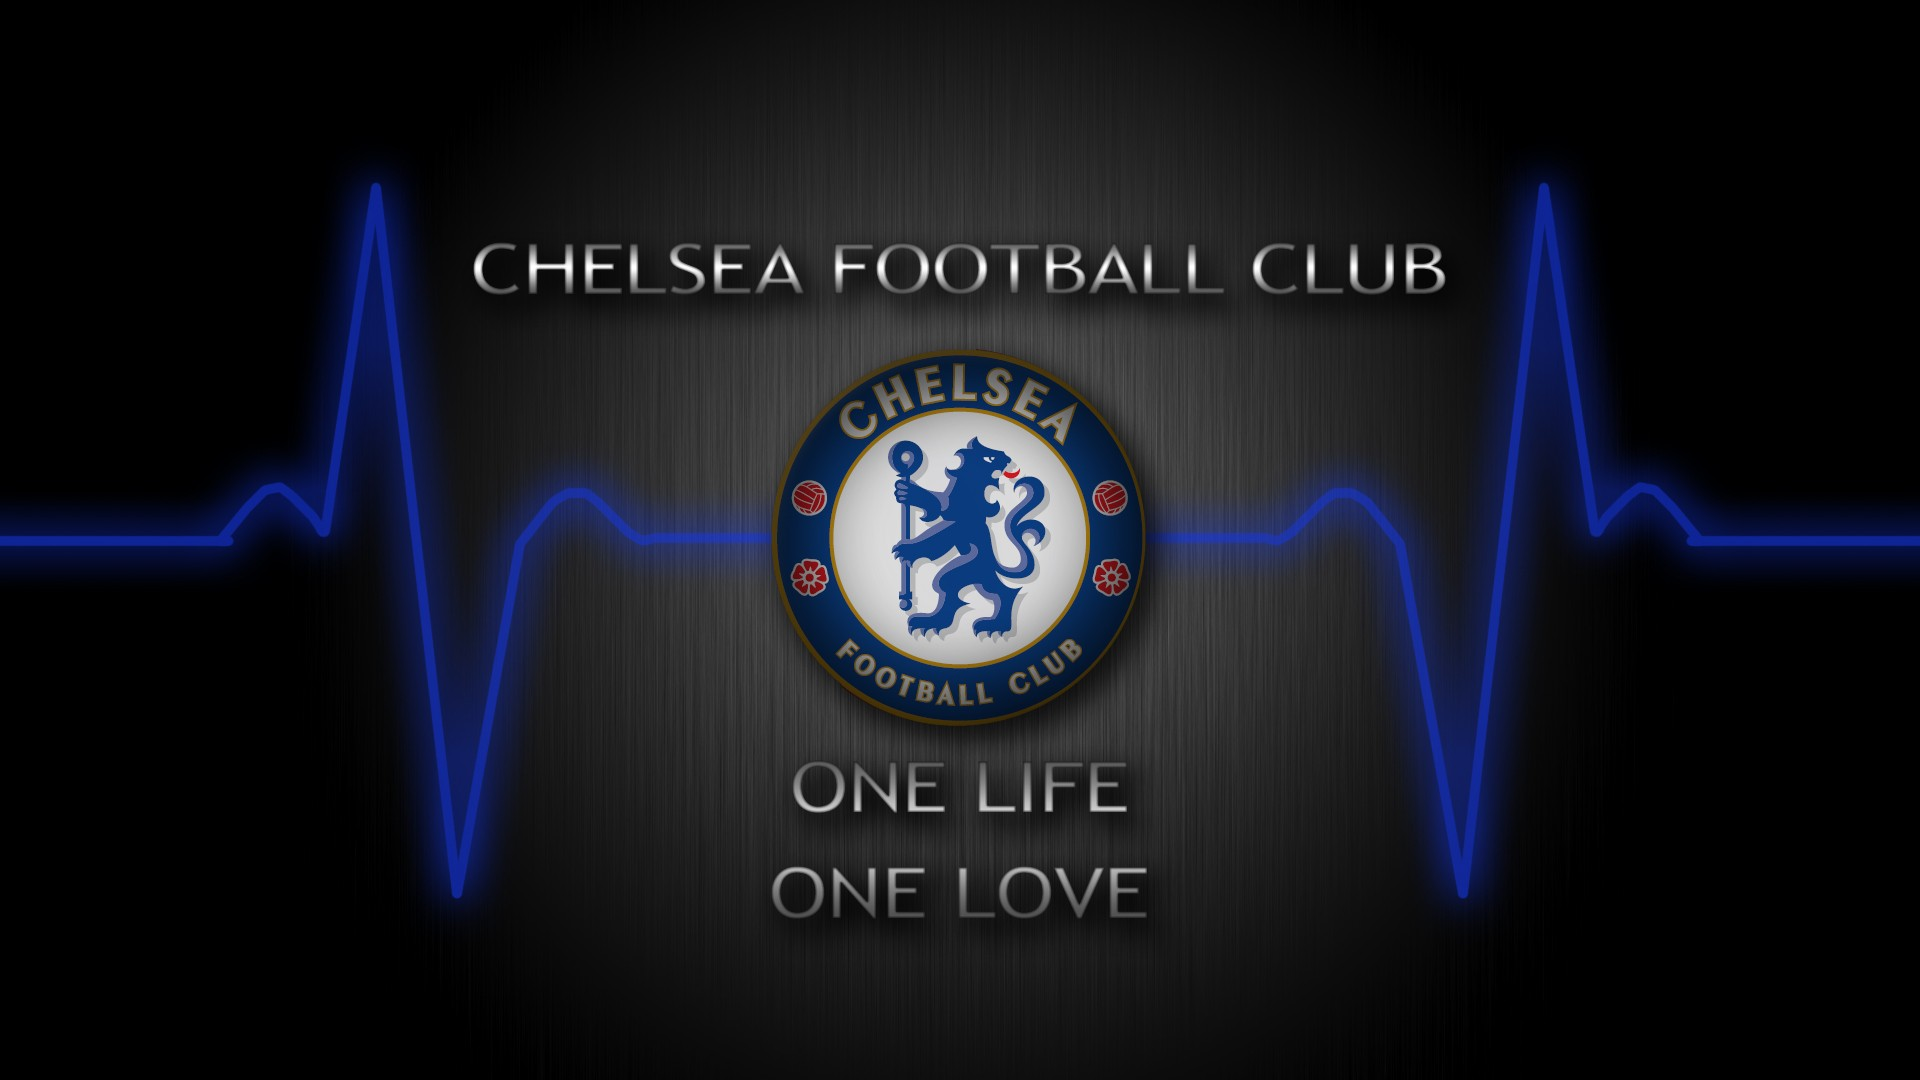 38 ] Chelsea HD Wallpapers 1080p On WallpaperSafari